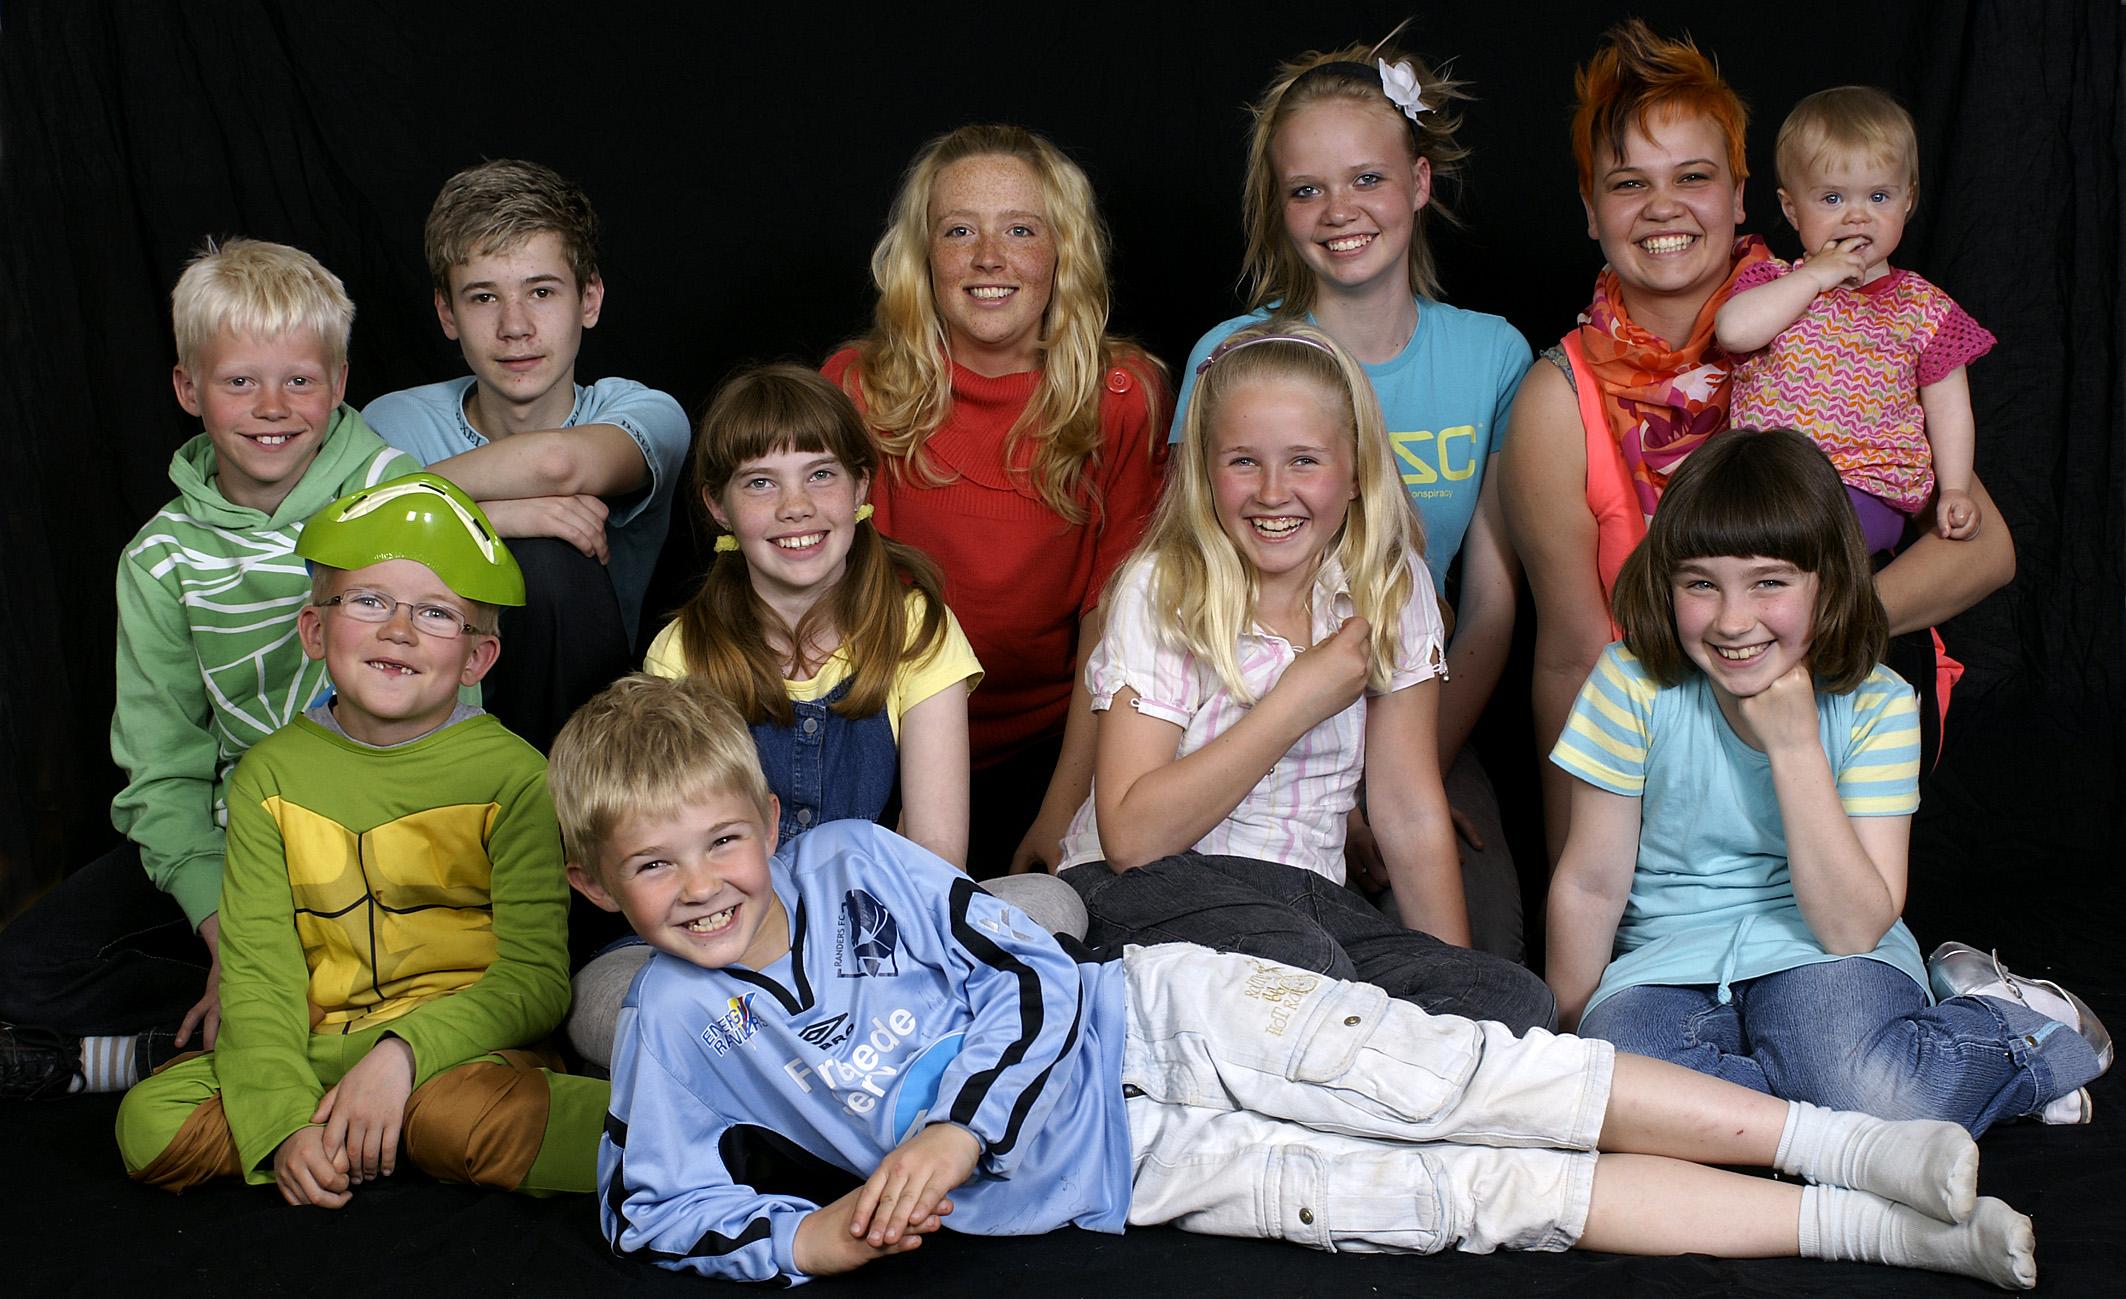 Børnefotograf - børnegruppe